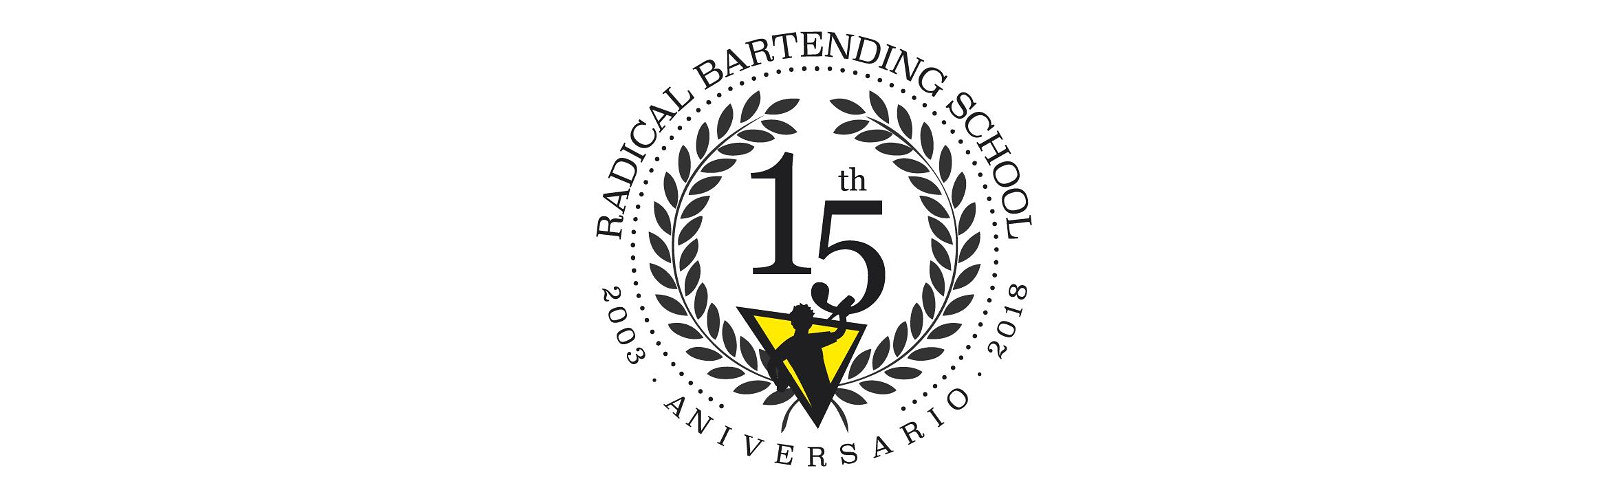 radica-bartending-school-bilbao